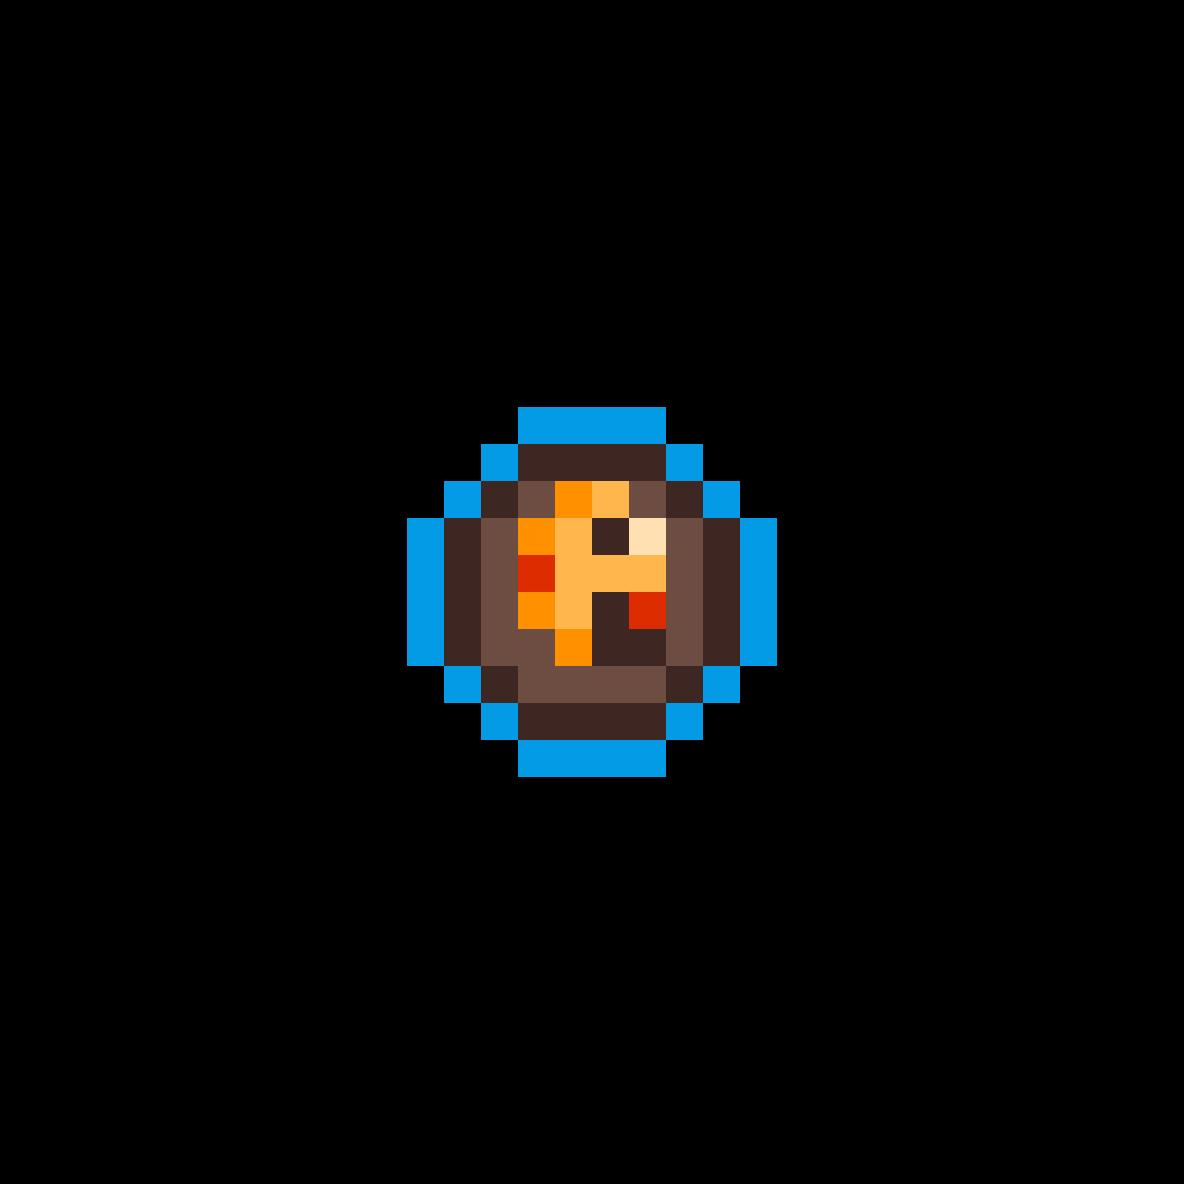 Cookie clicker achievement by Pixelart-King